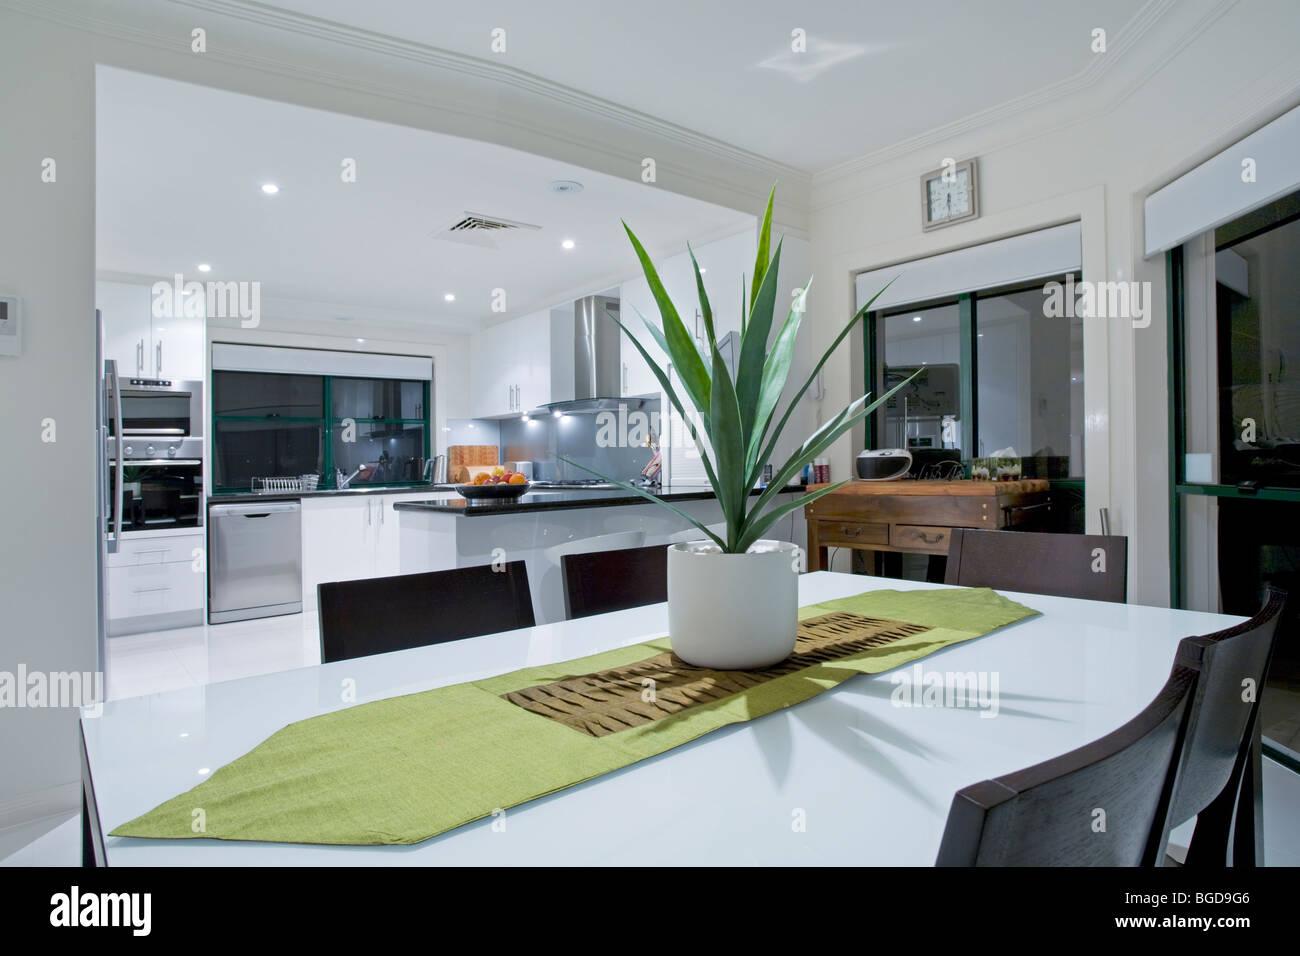 moderne k che in luxusvilla stockfoto bild 27337750 alamy. Black Bedroom Furniture Sets. Home Design Ideas